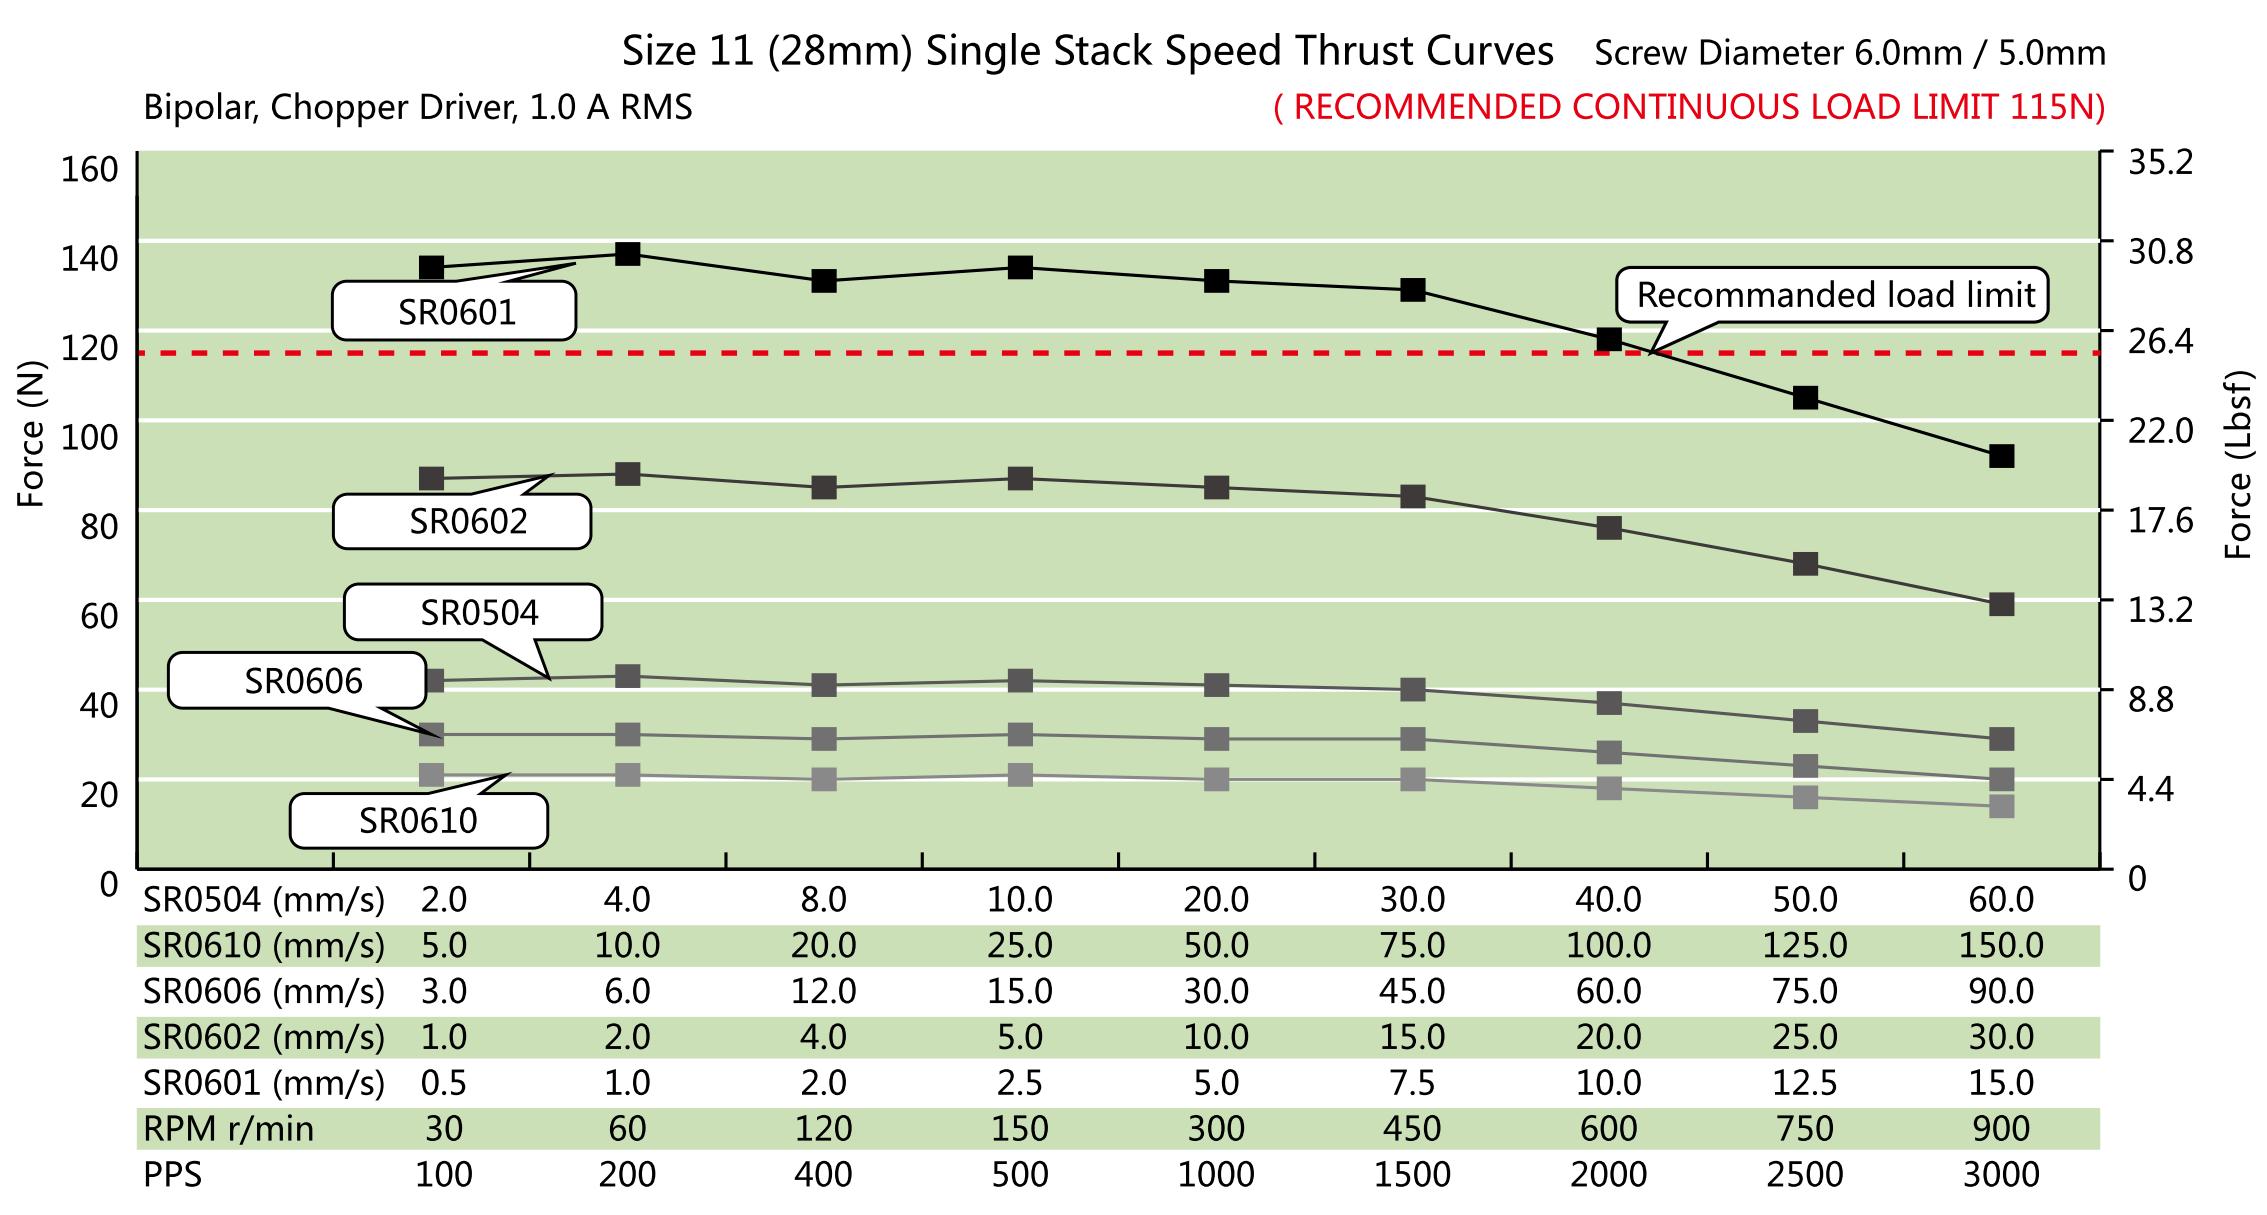 NEMA 11 Single Stack Ball Screw Actuator Speed Thrust Curve